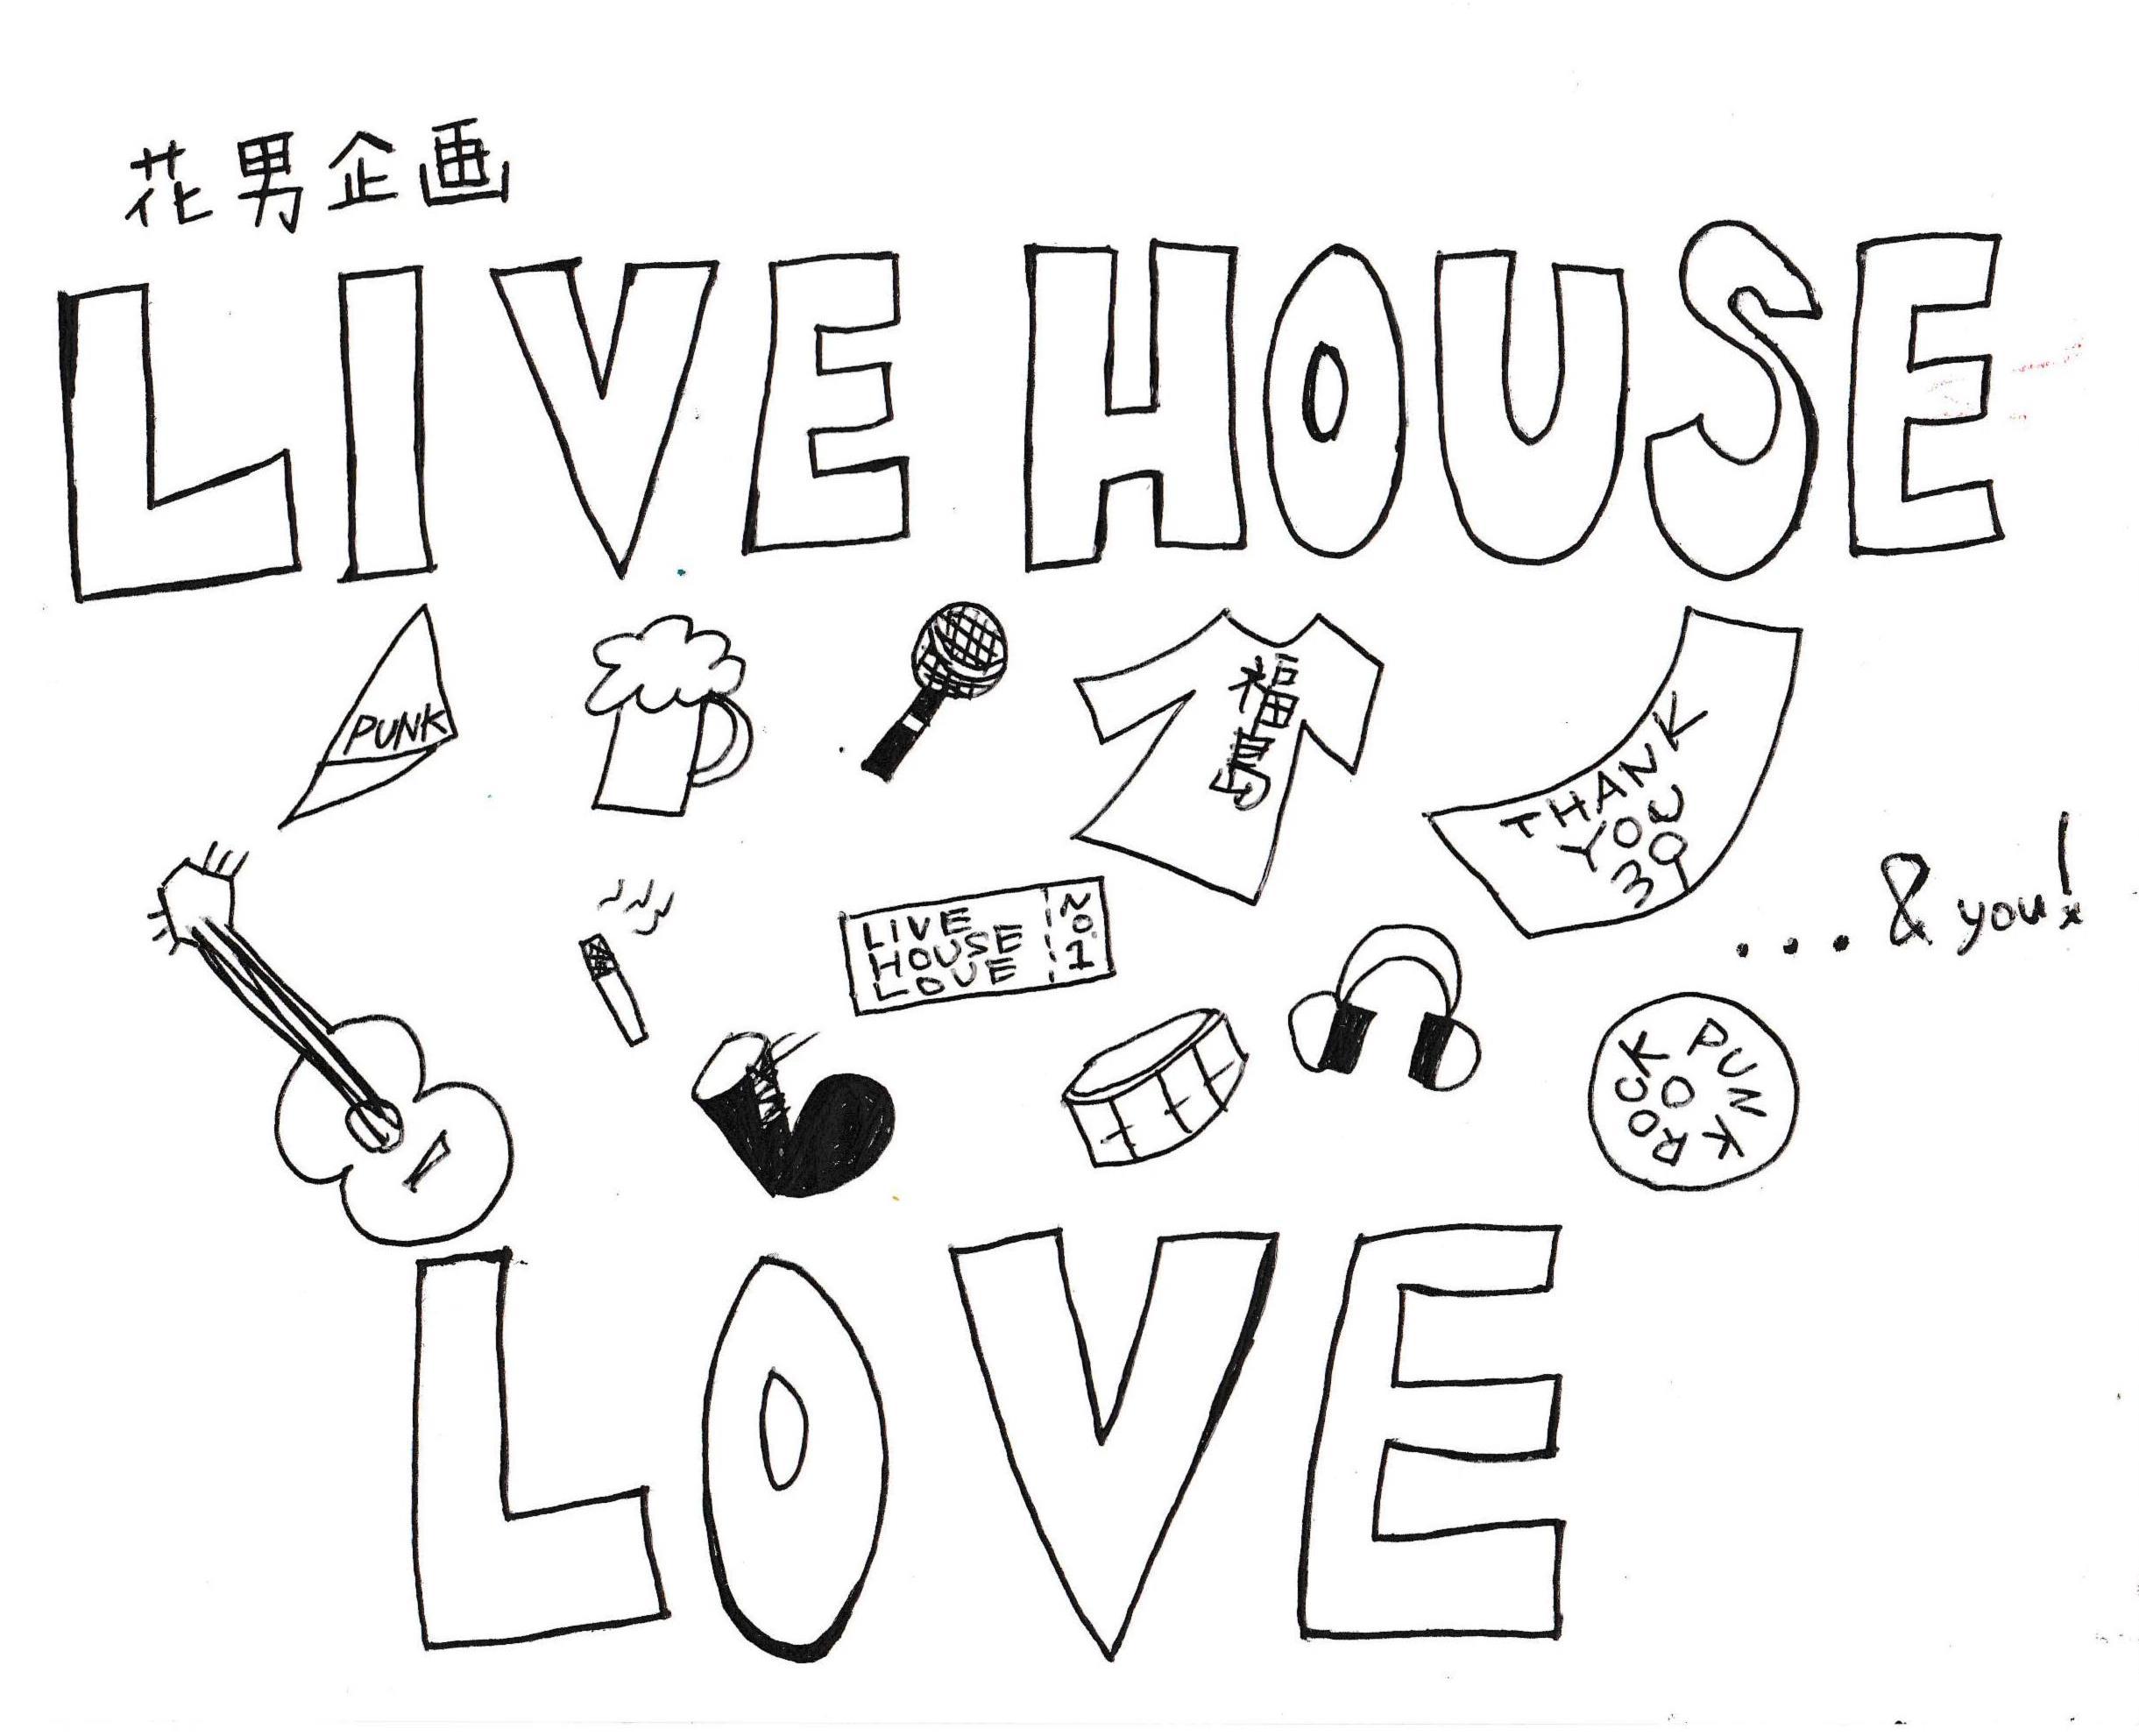 LIVE HOUSE LOVE